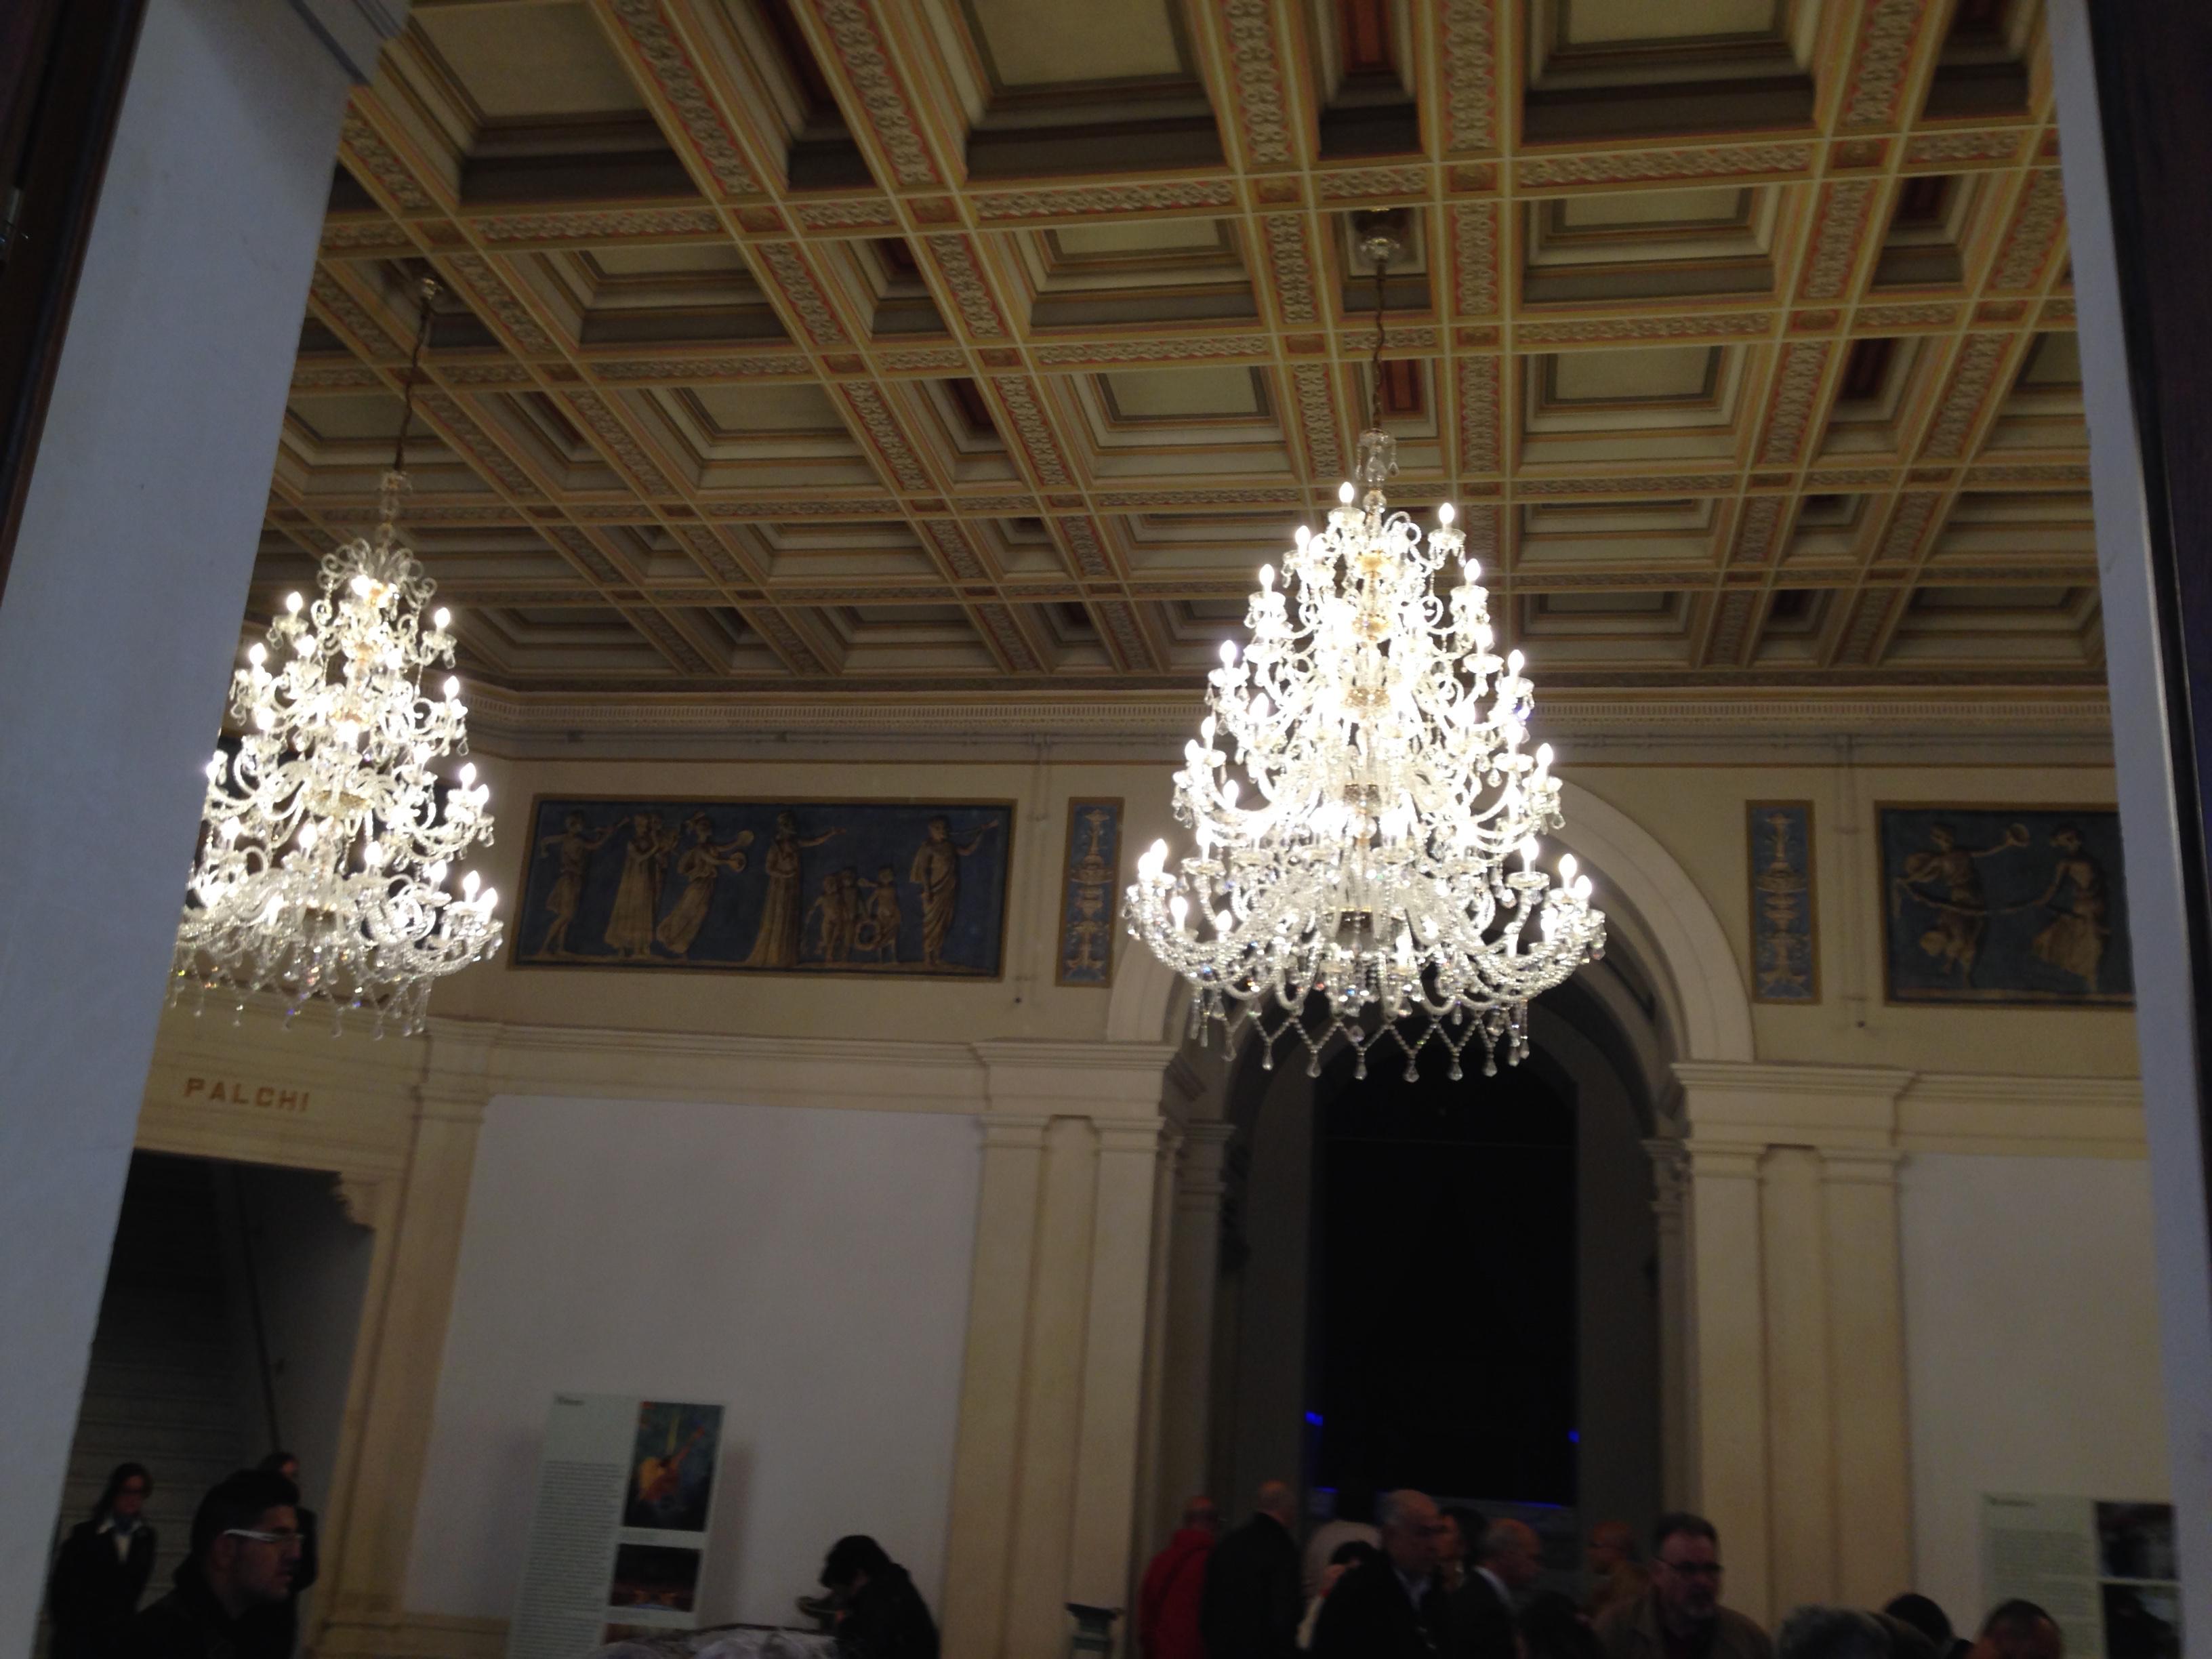 Lampadario Da Ingresso : File:lampadari ingresso del teatro.jpg wikipedia